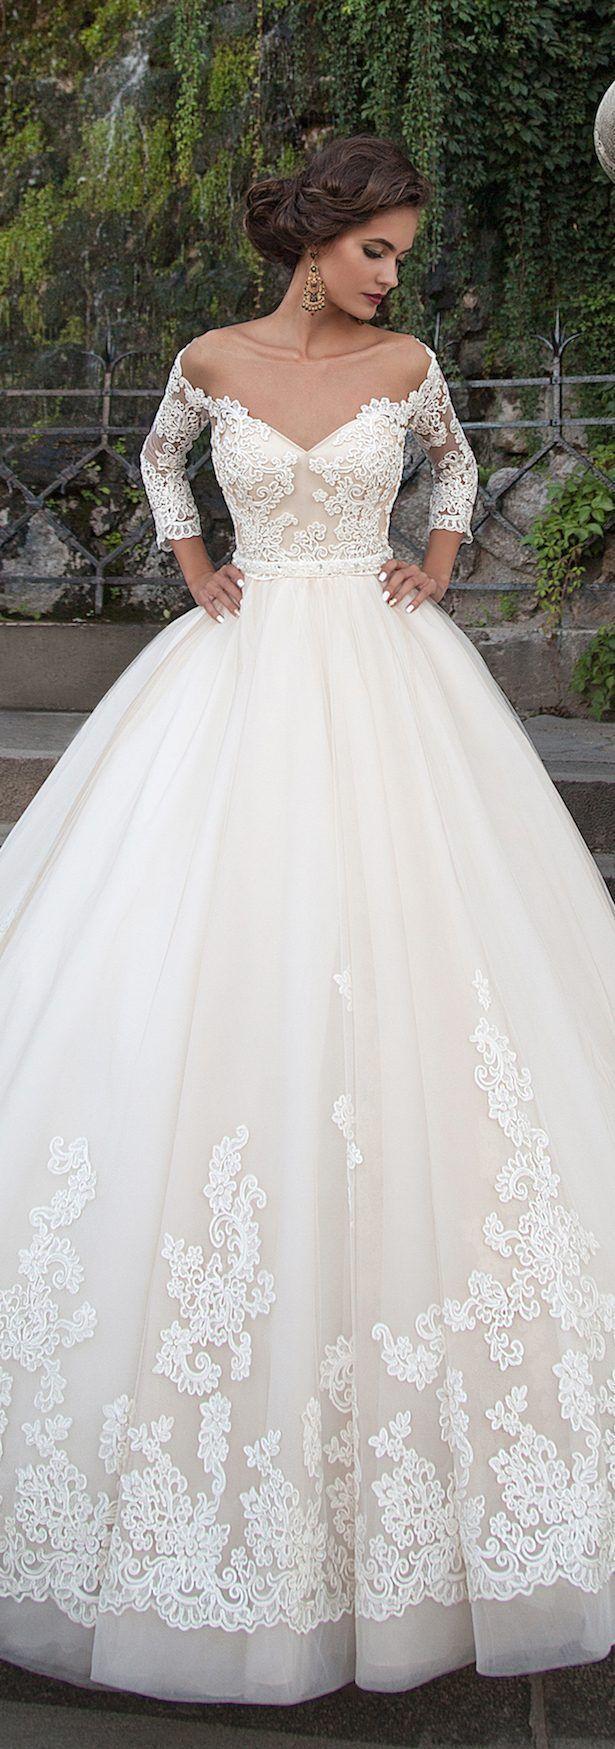 Milla Nova 2016 Bridal Collection - Diona #weddingdress